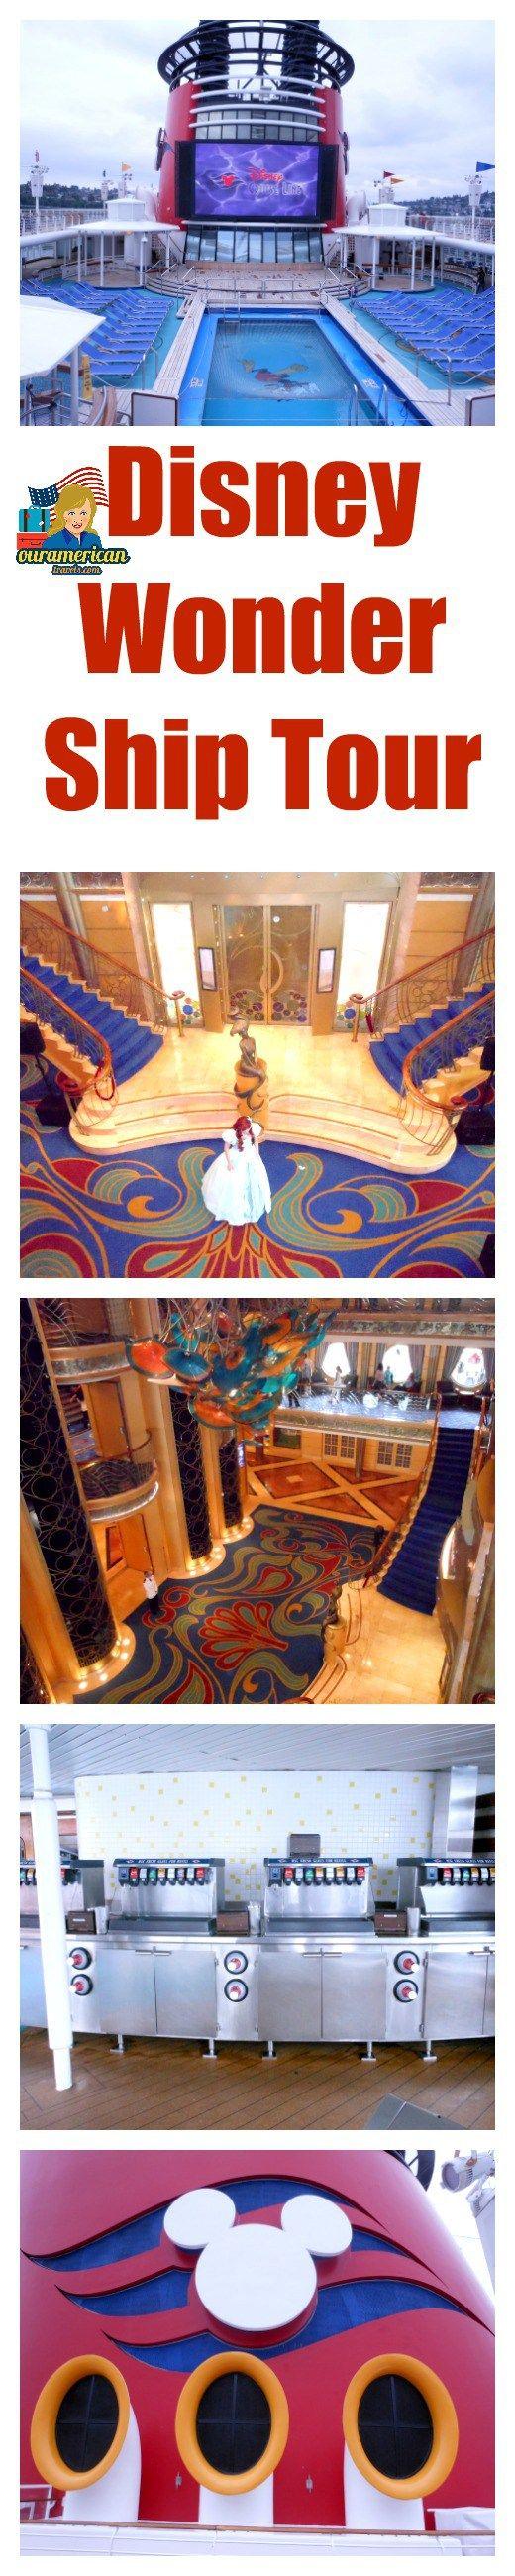 Best 25 Disney Wonder Cruise Ideas On Pinterest Disney Cruise Tips Disney Cruse And Disney